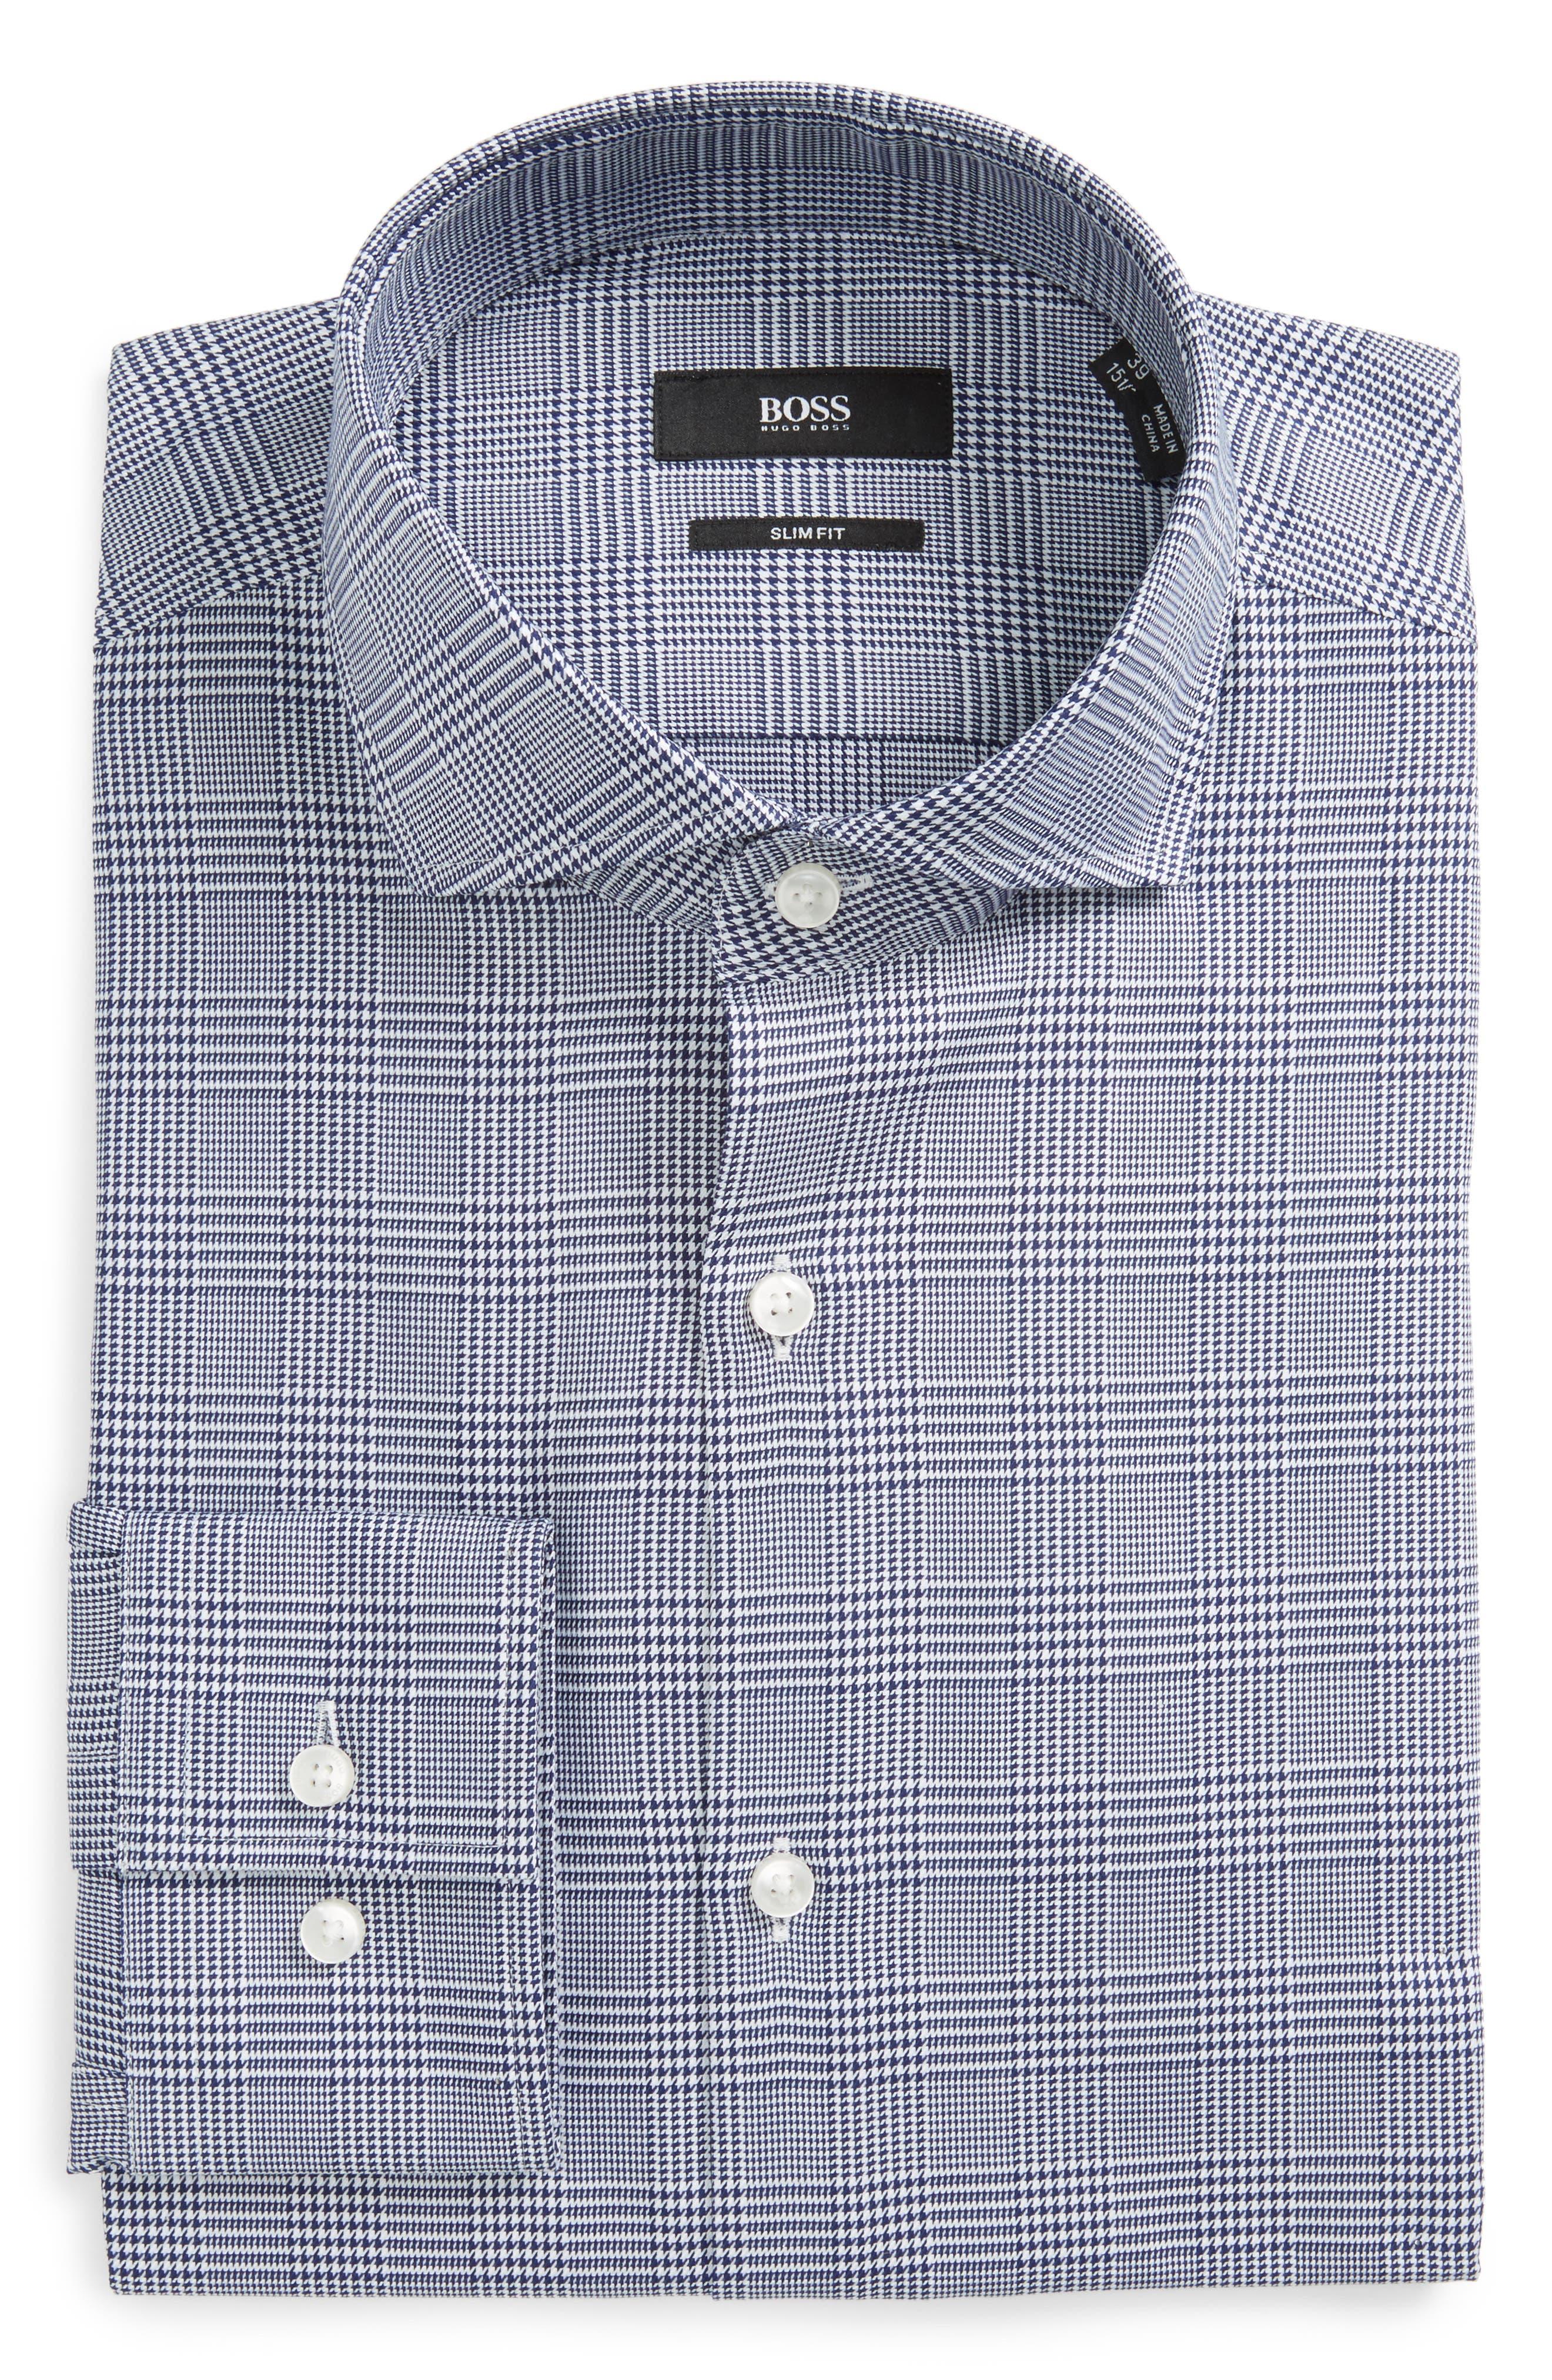 Main Image - BOSS Slim Fit Plaid Dress Shirt